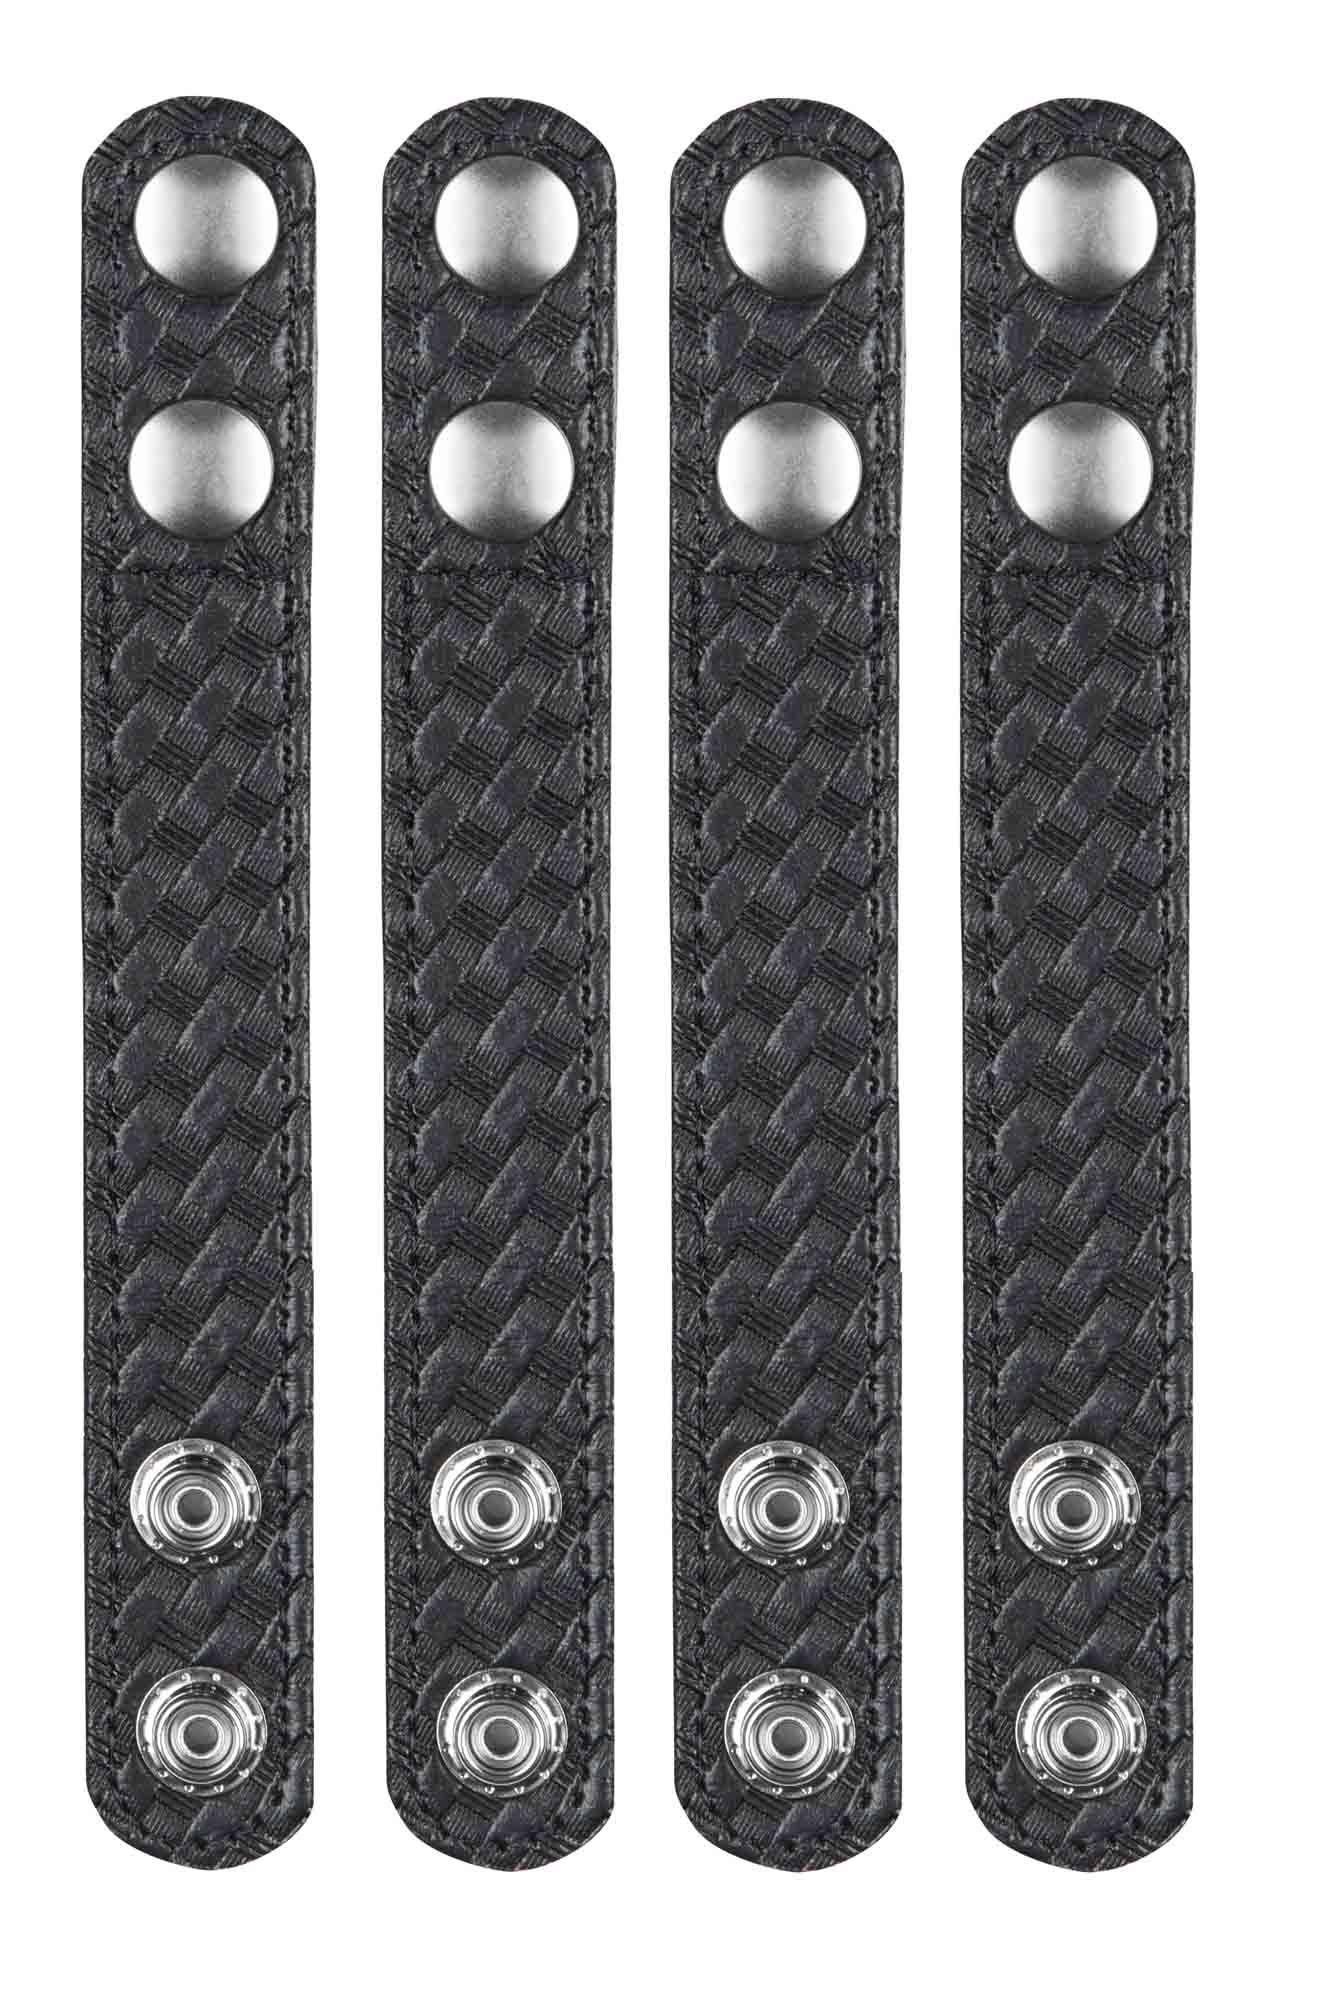 "Black 4 Pack Bianchi Accumold 1/"" Belt Keepers w// Black Snap Closure"